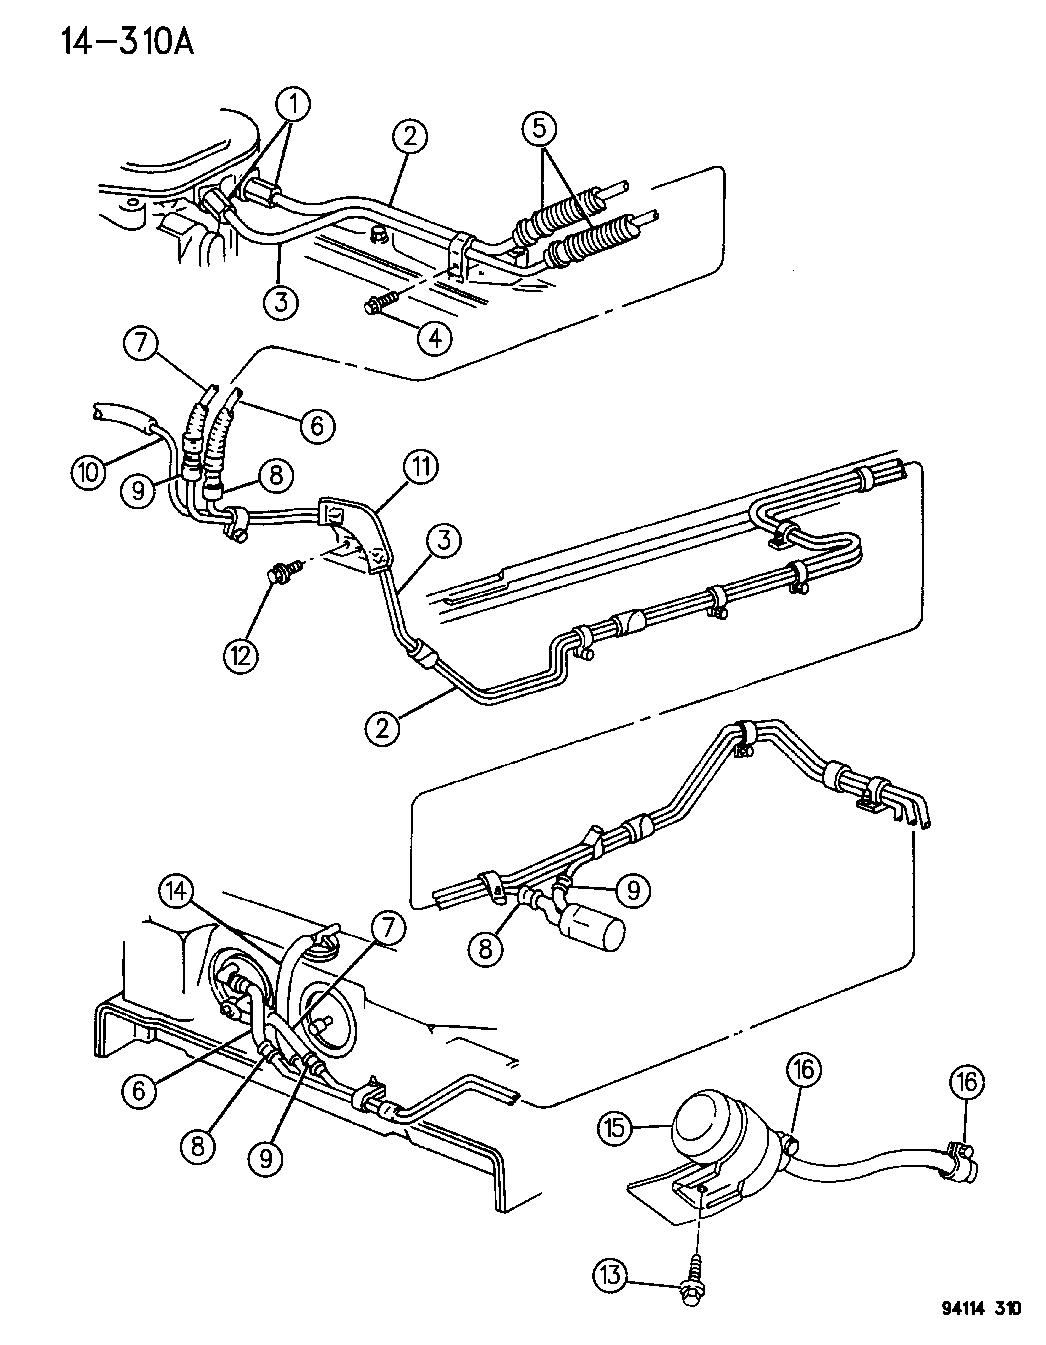 1995 Chrysler LeBaron Fuel Lines & Filter